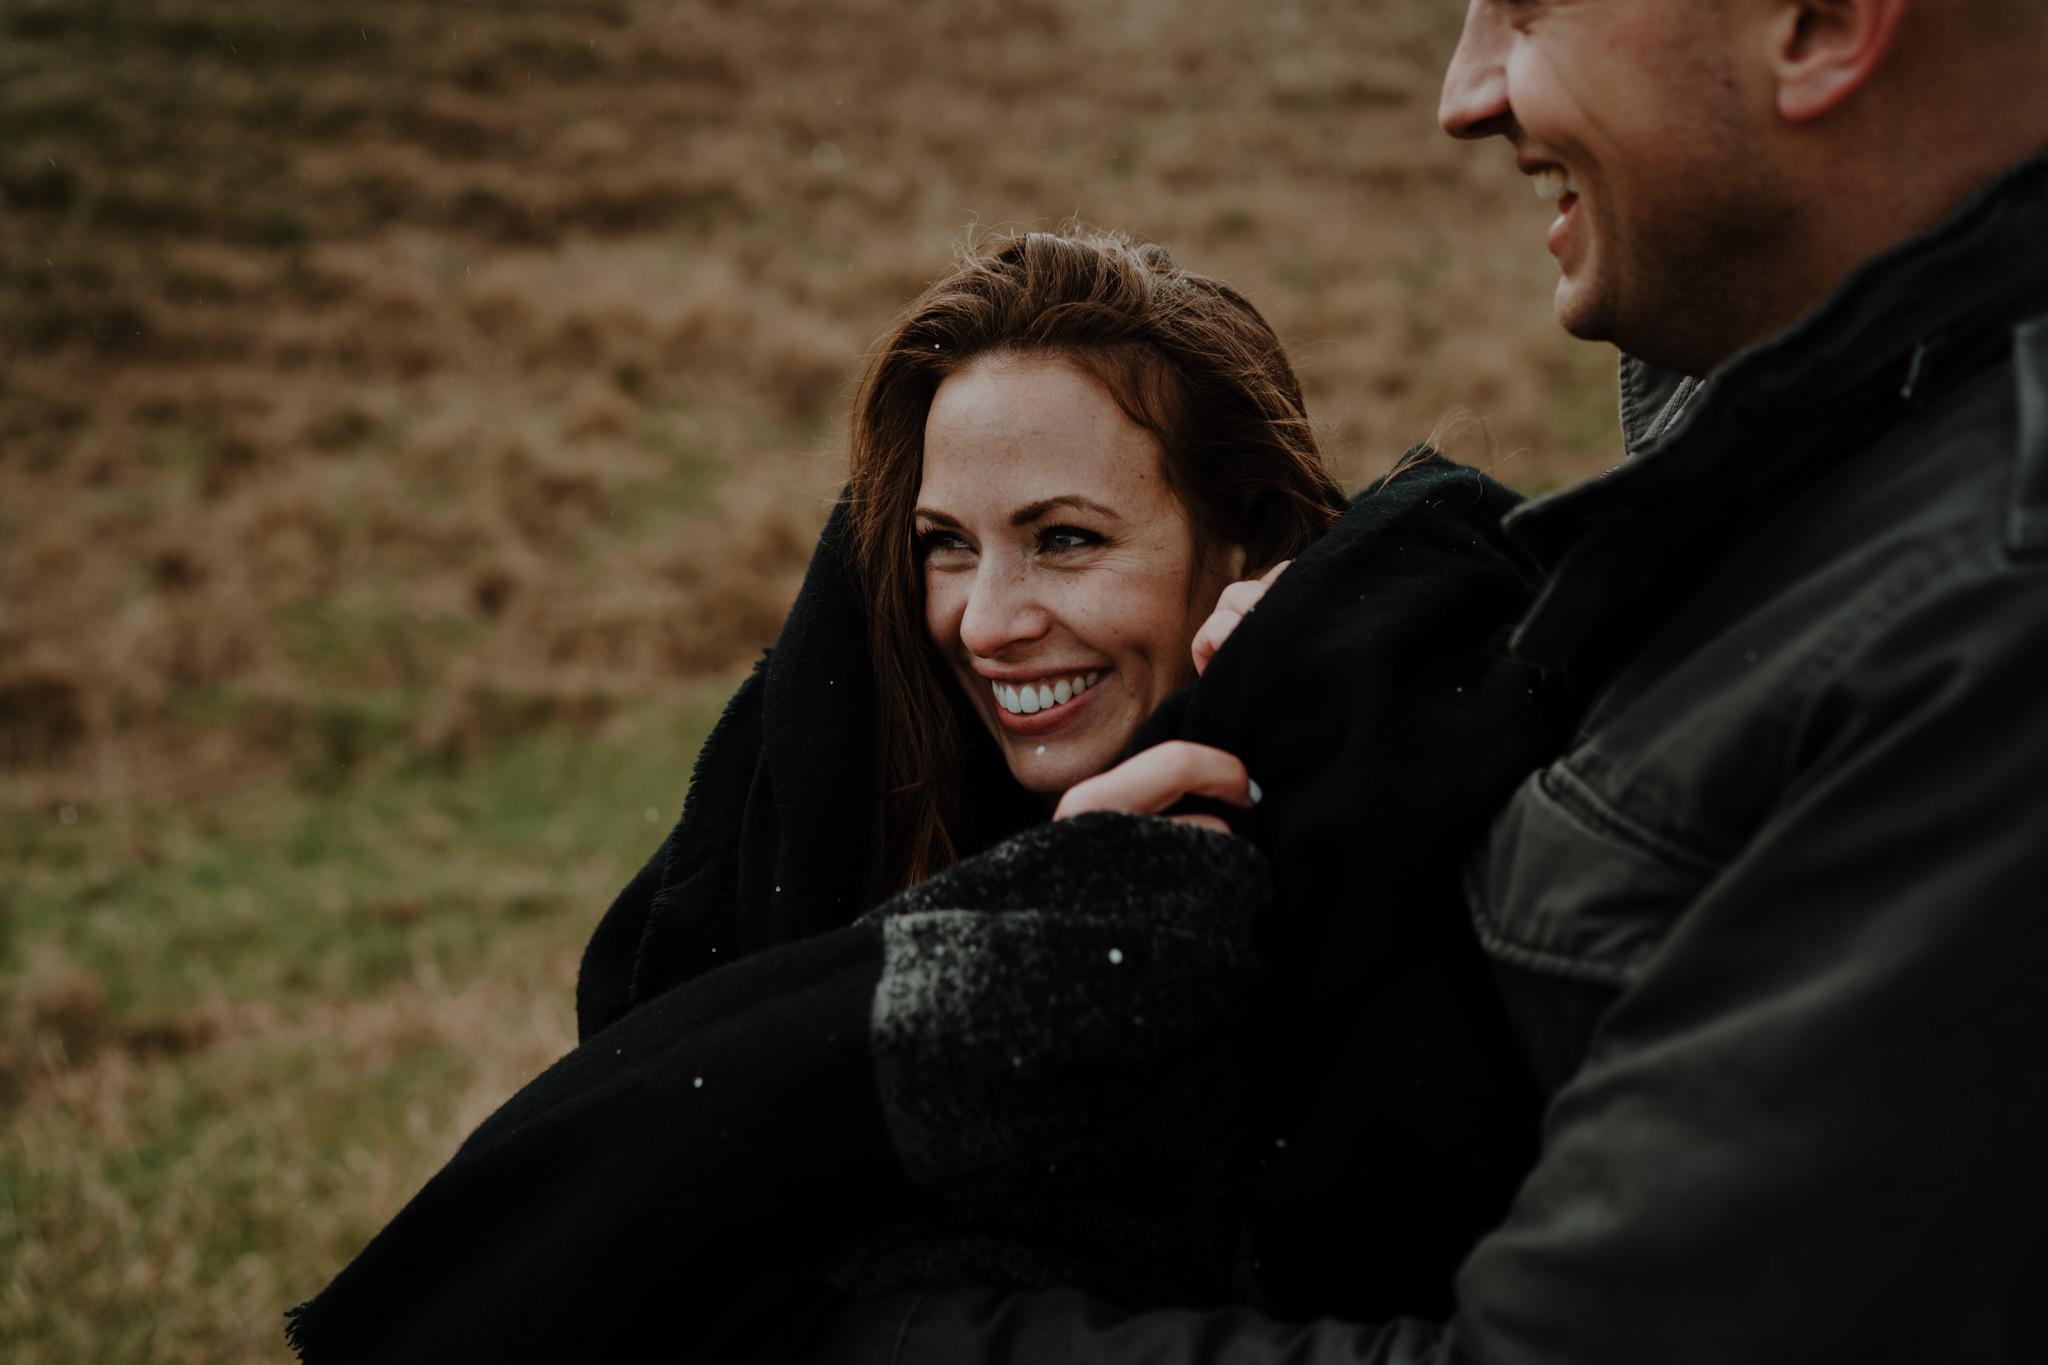 american couple visit ireland kinbane castle laughing